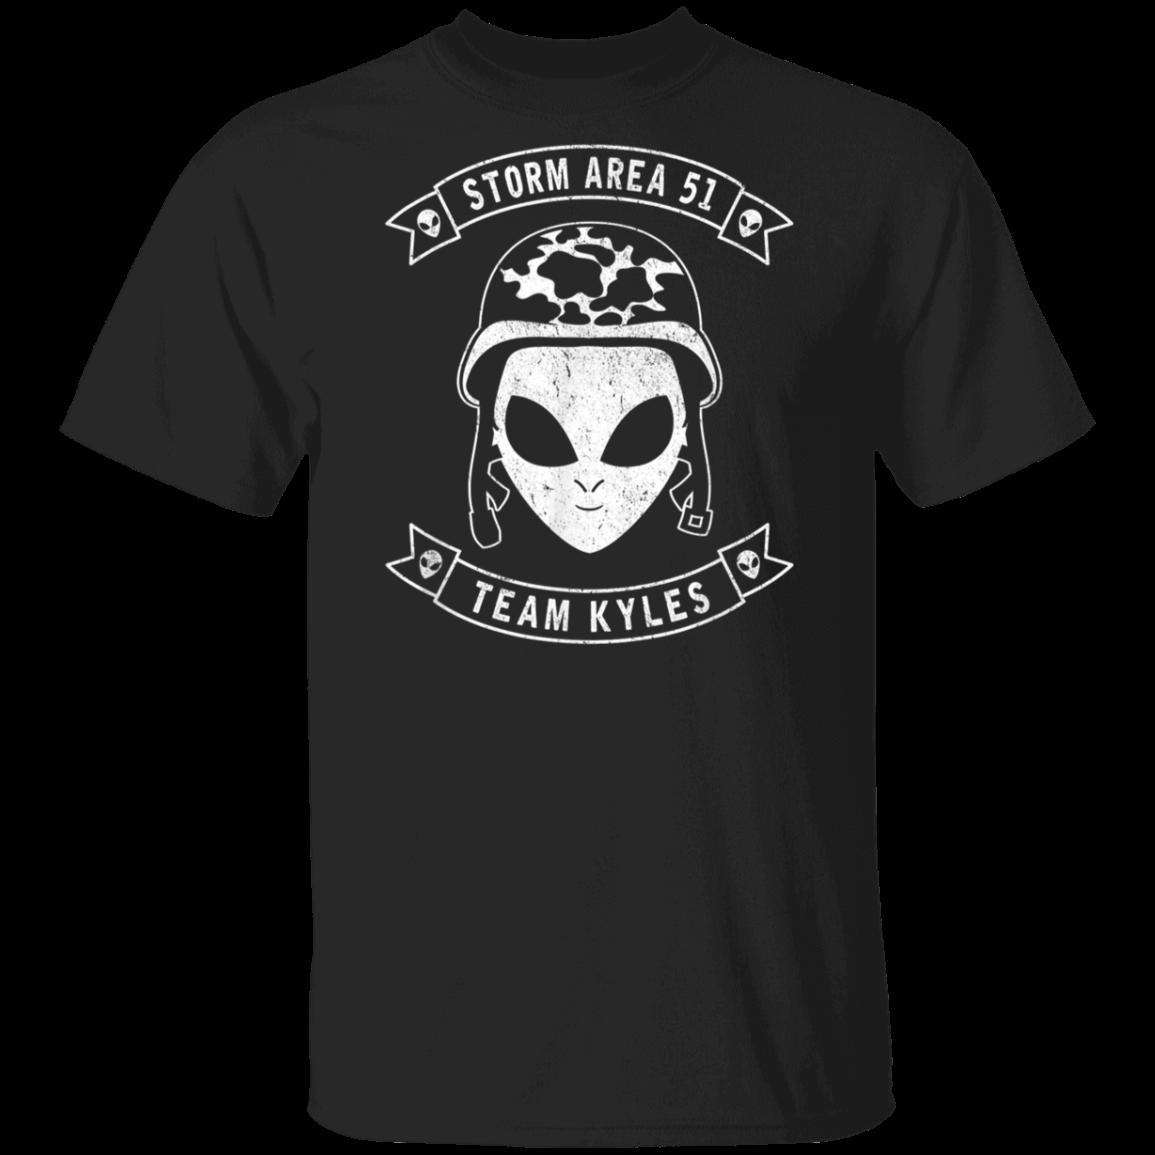 Storm Area 51 – Team Kyles – Camo Military Alien  T-Shirt